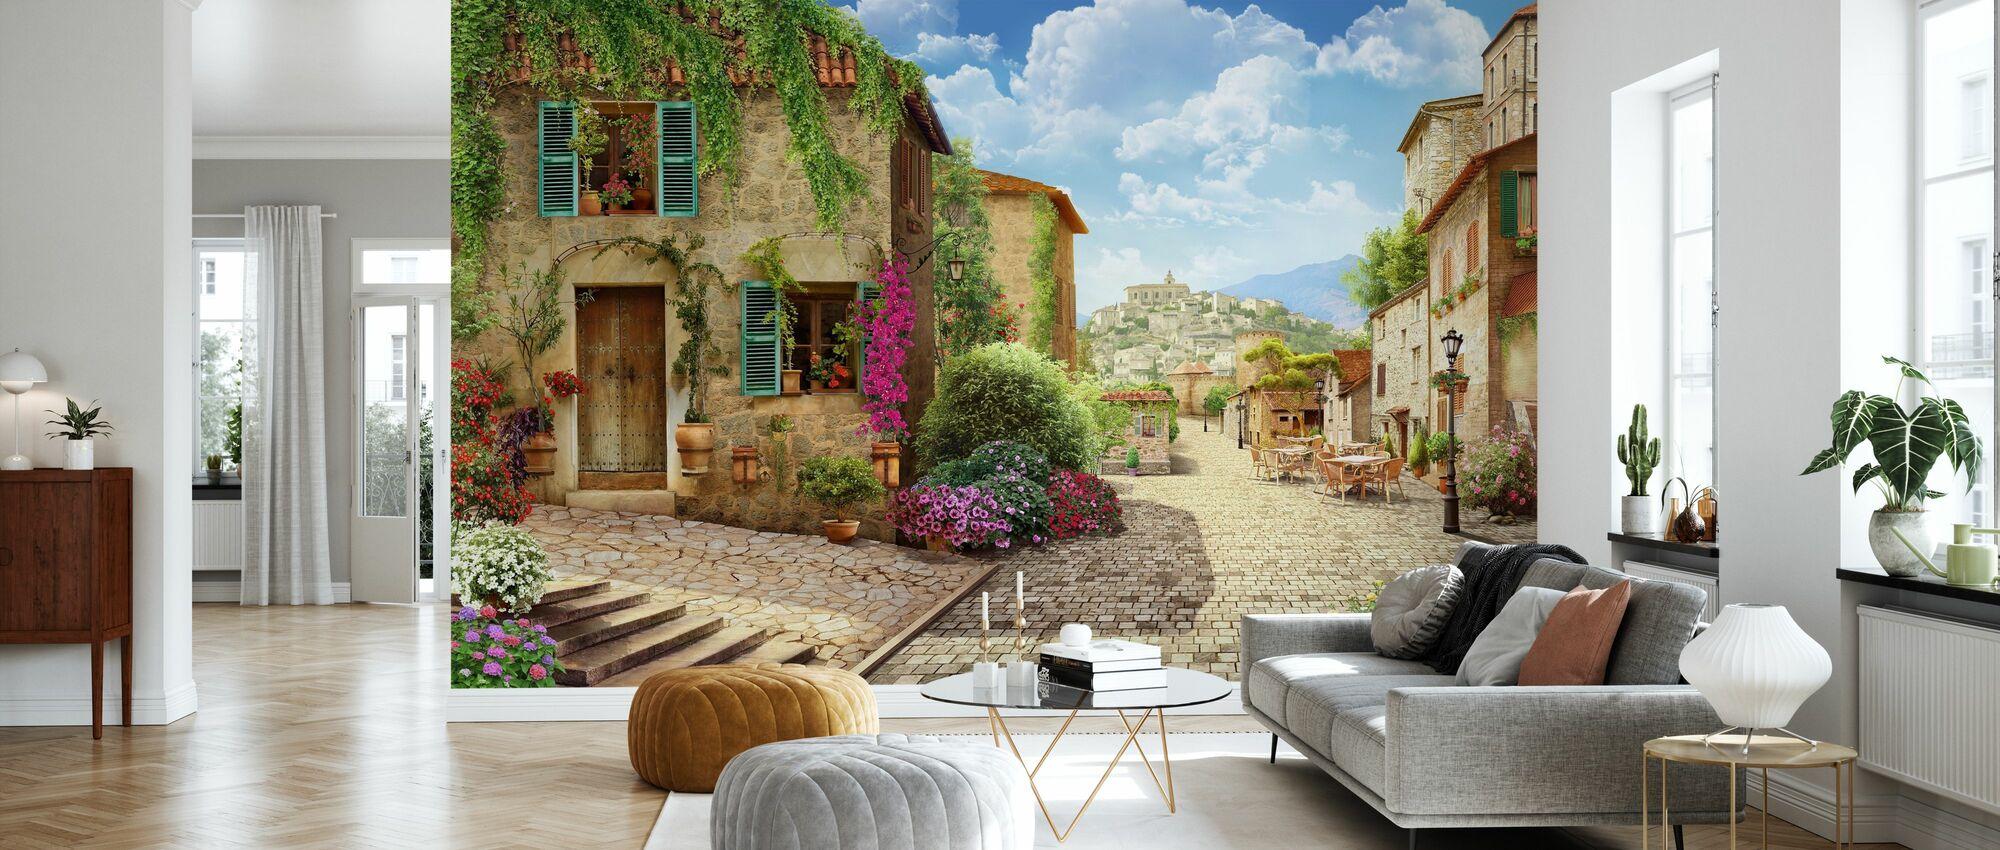 Tuscany Street - Wallpaper - Living Room